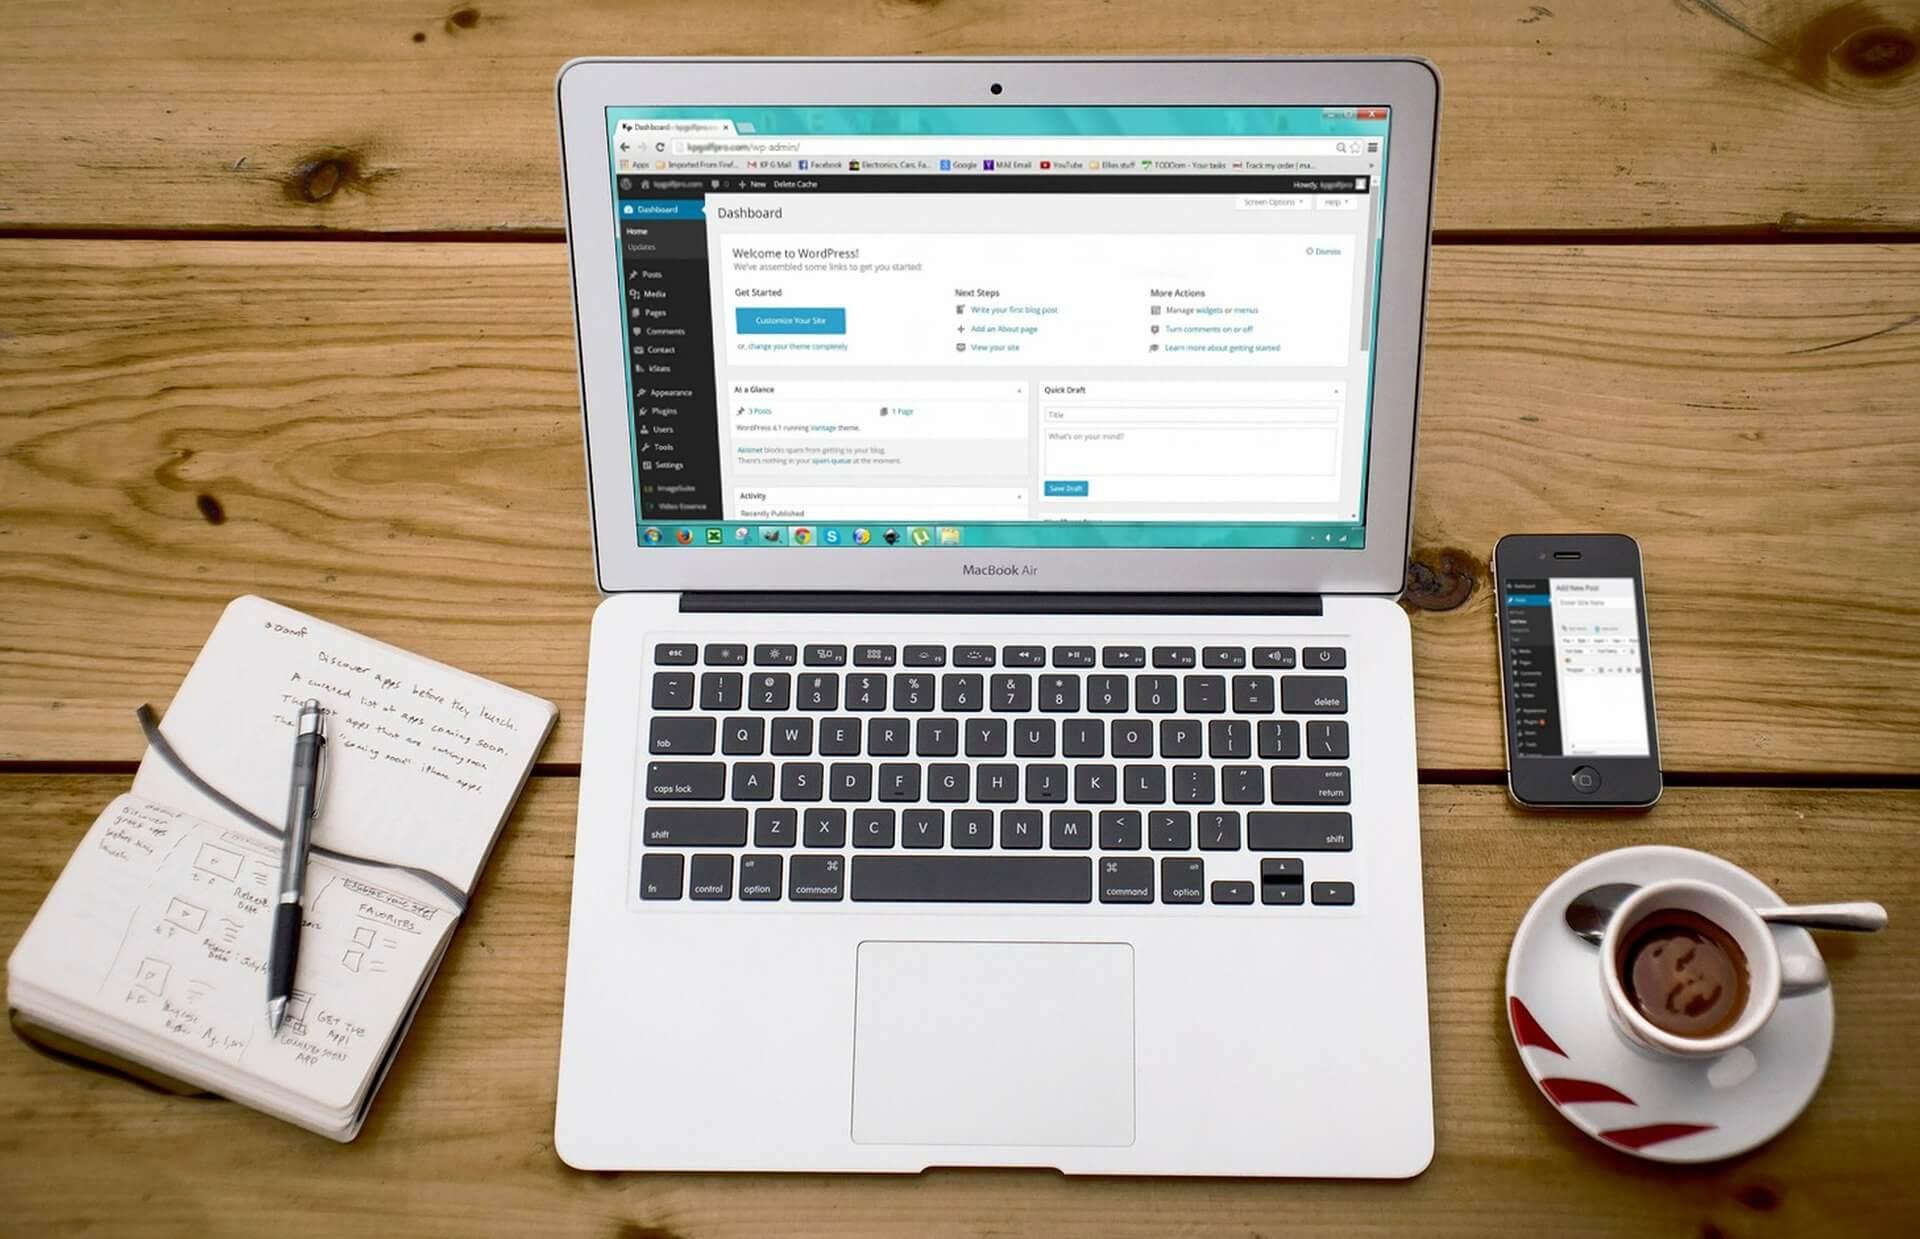 Build WordPress websites for clients   Make Money With WordPress